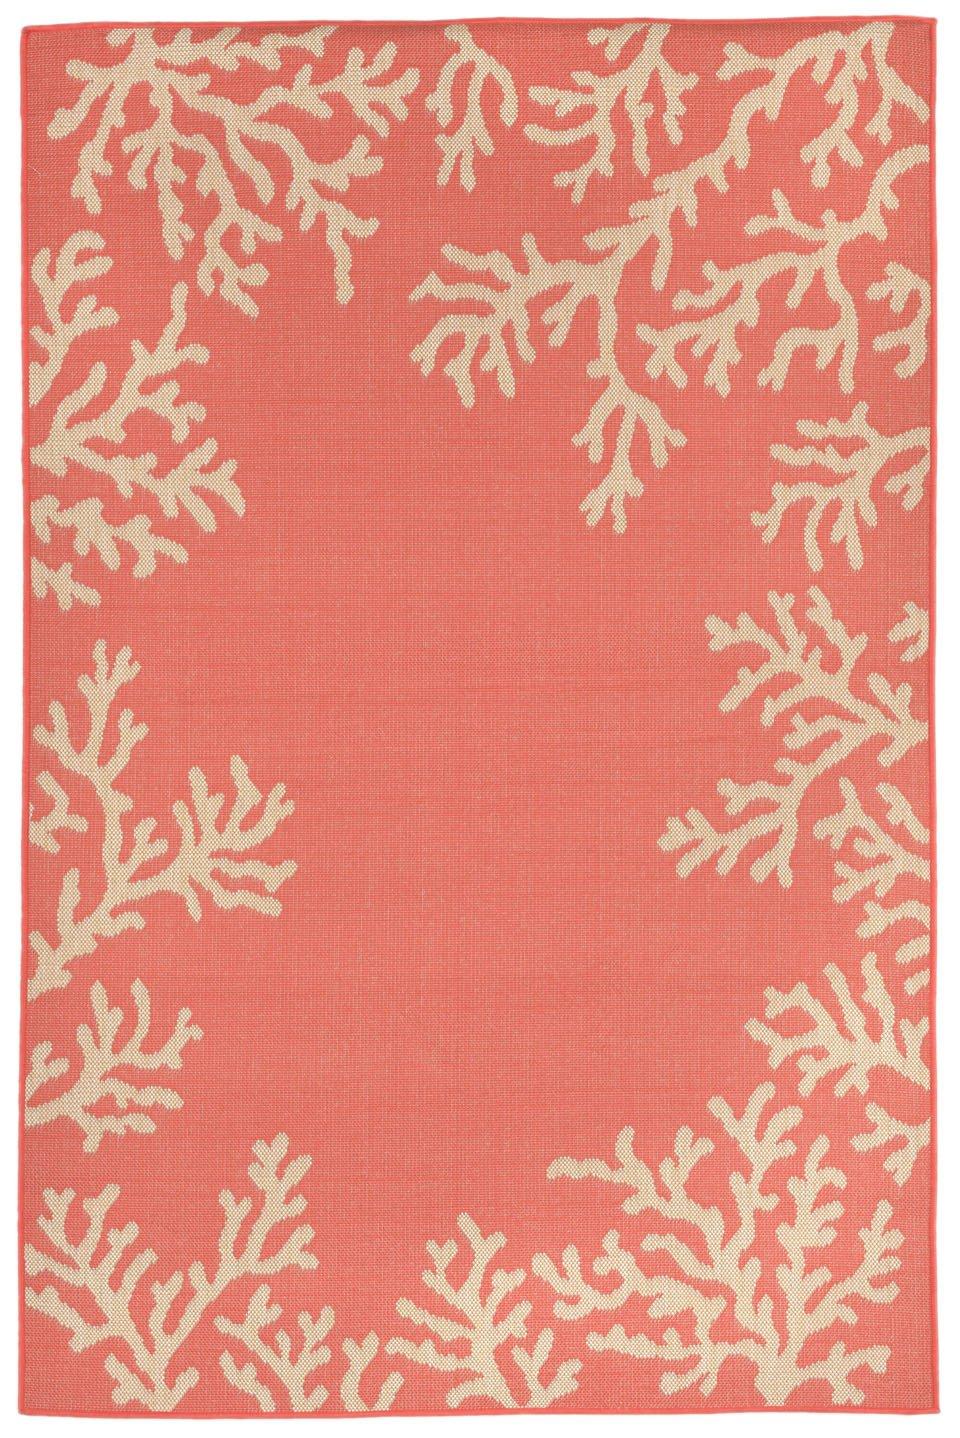 Liora Manne Veranda Staghorn Border Rug, Indoor/Outdoor, 39'' 59'', Coral Orange